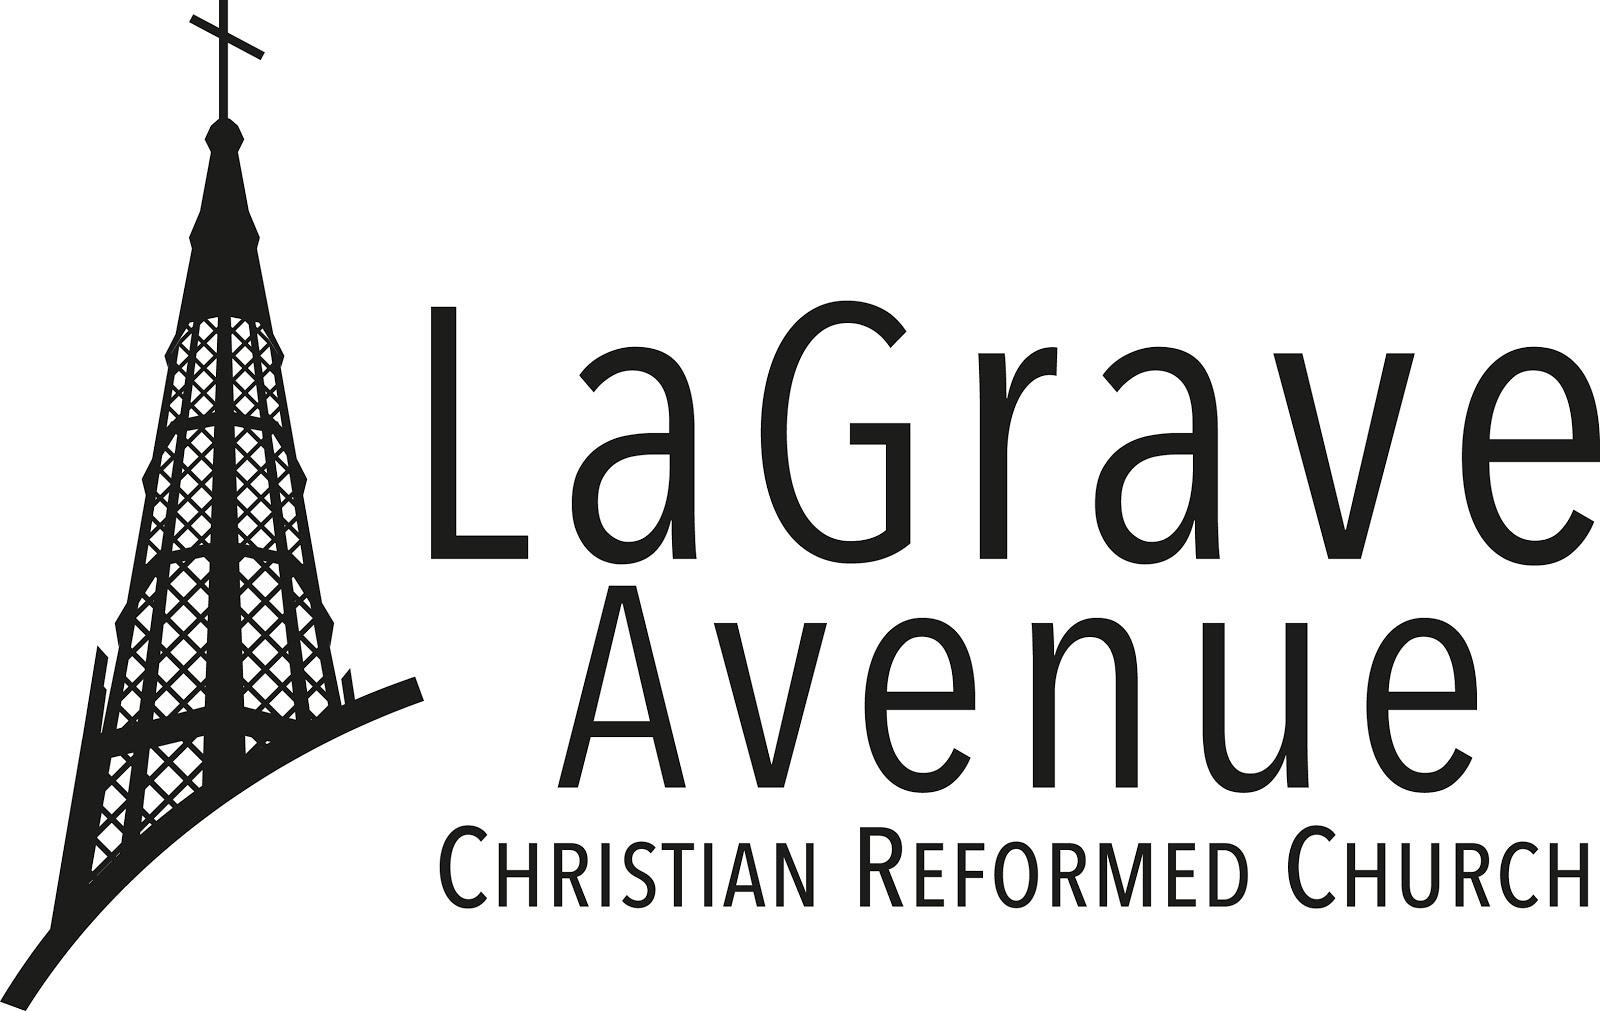 LaGrave Avenue Christian Reformed Church